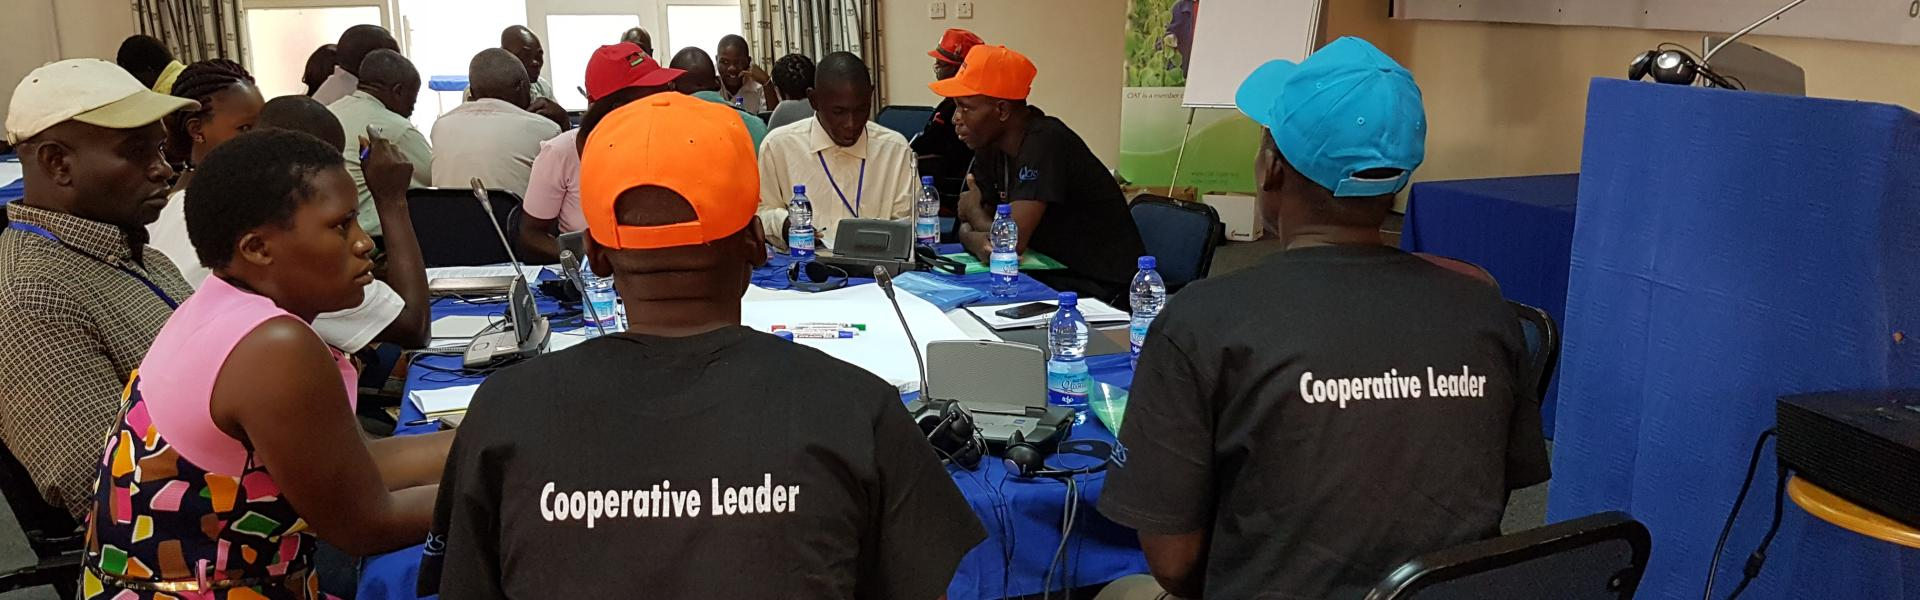 Cooperative Leadership Event: Malawi, 2016